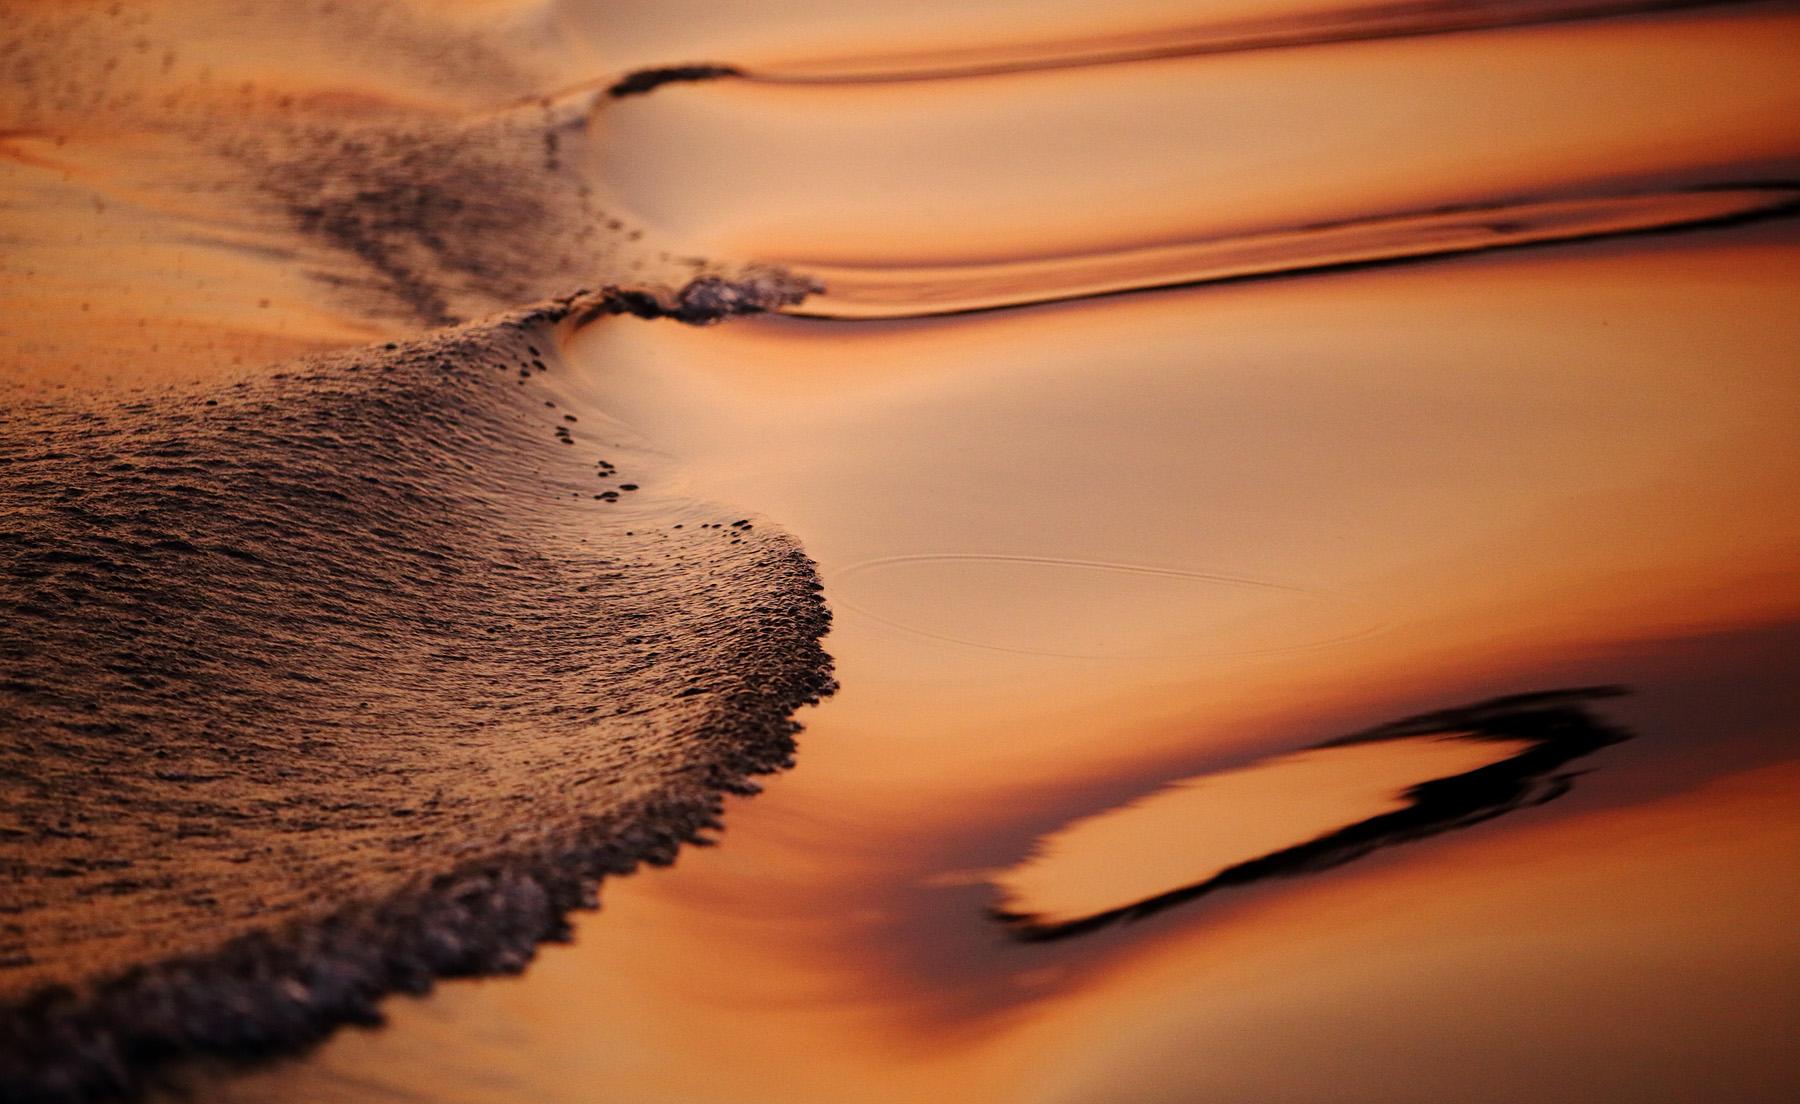 Hintergrundbilder : Sonnenlicht, Boot, Sonnenuntergang, abstrakt ...